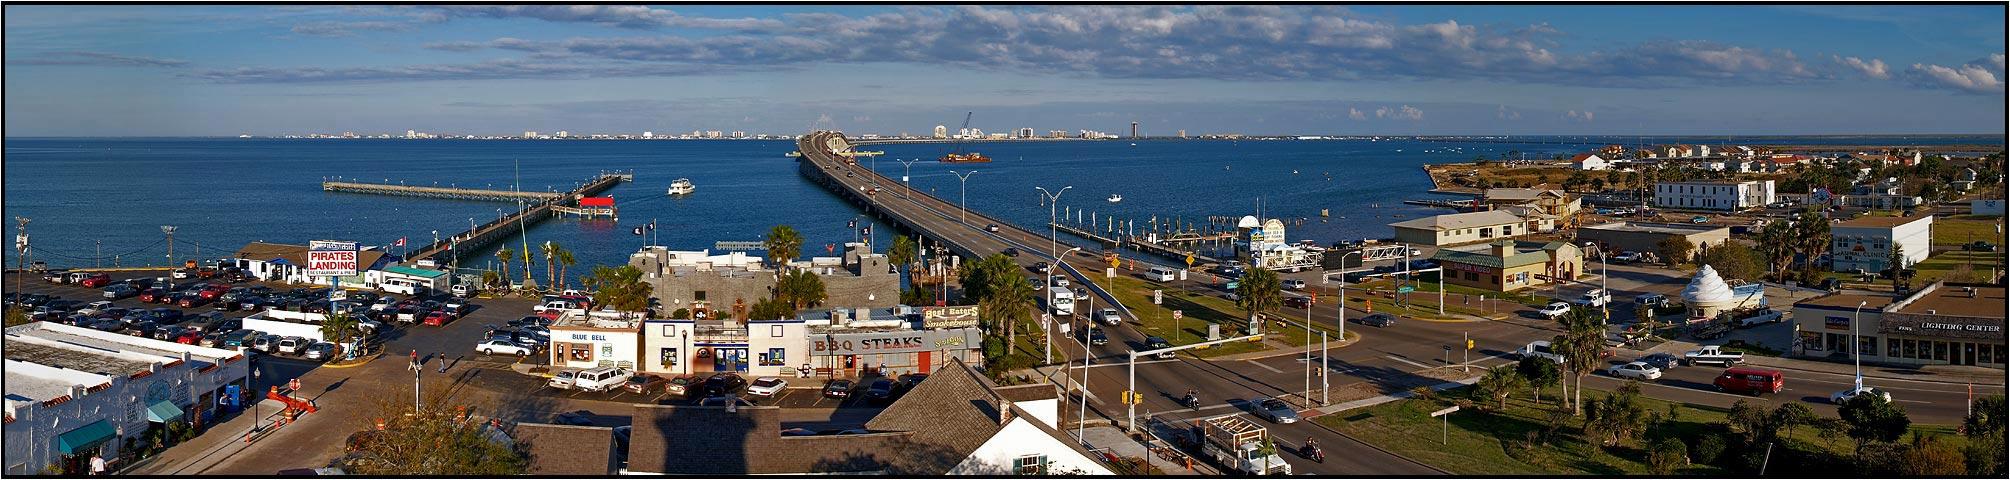 Port Isabel [panografie]